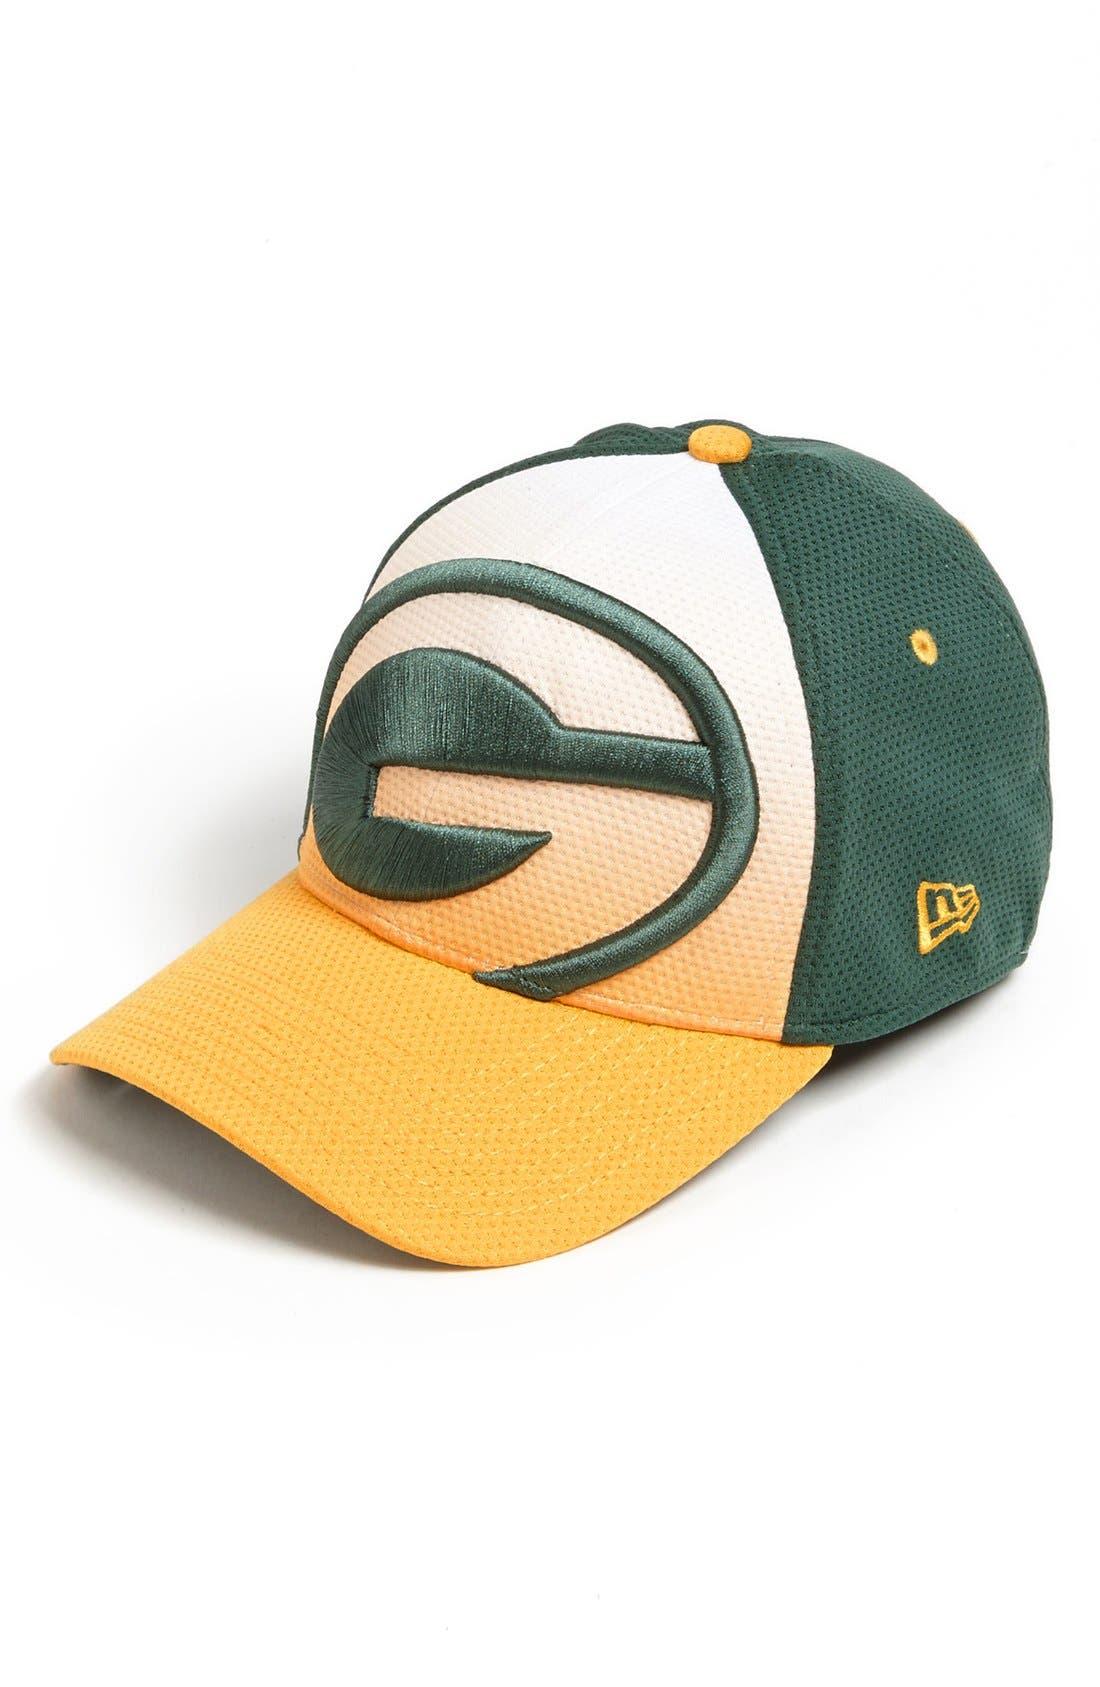 Alternate Image 1 Selected - New Era Cap 'Gradation - Green Bay Packers' Baseball Cap